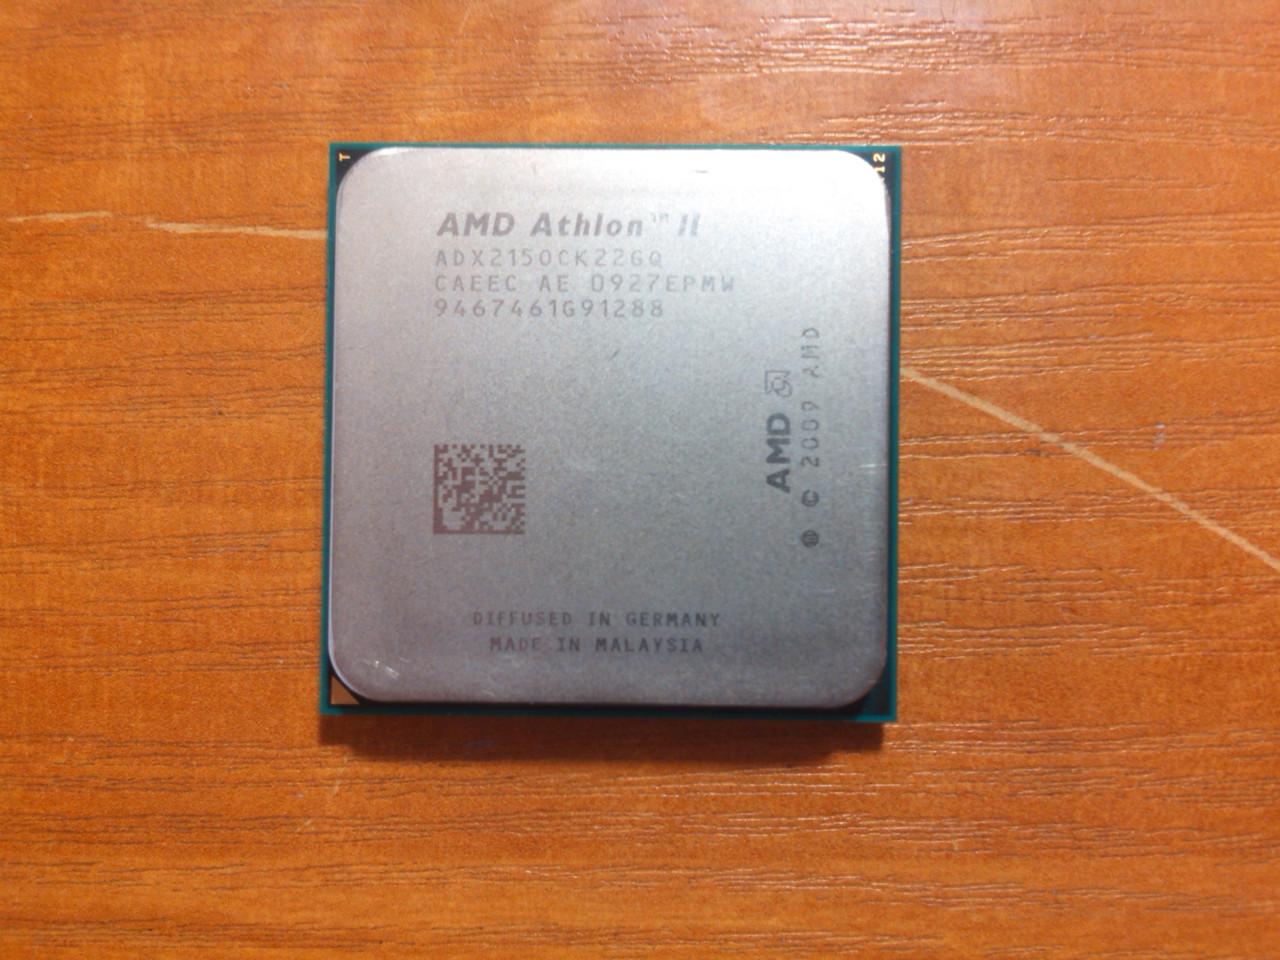 AMD Athlon II X2 215 ADX215OCK22GQ Гарантия!